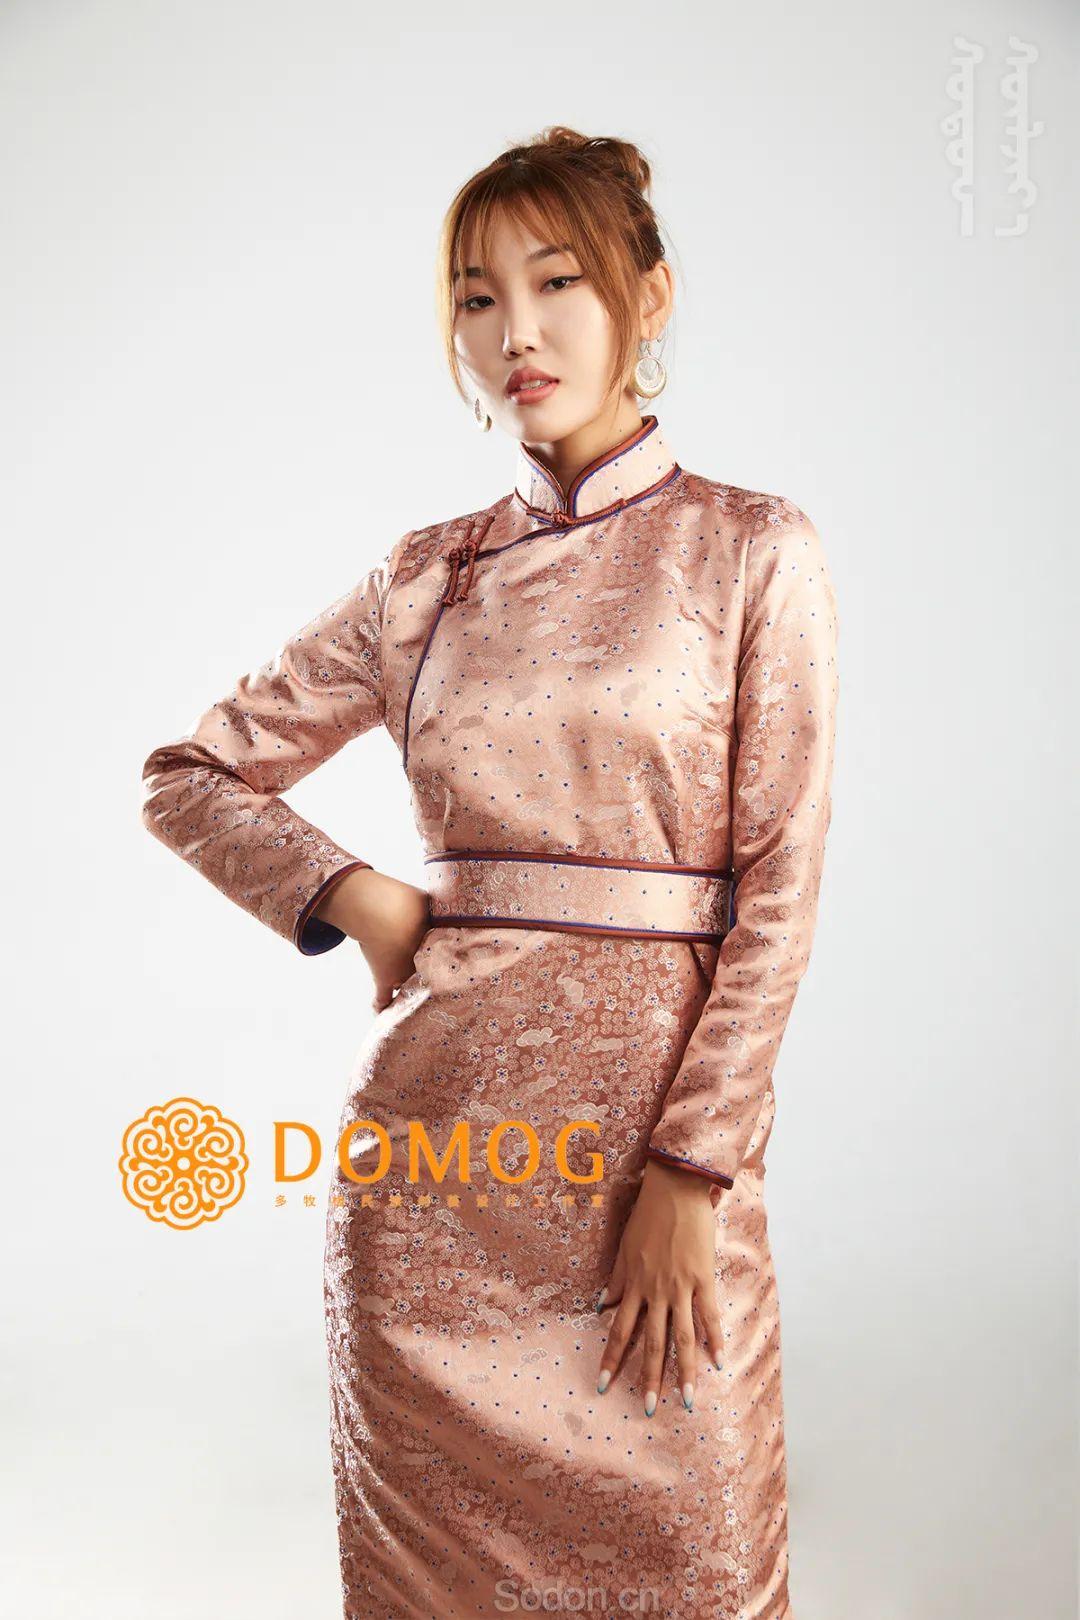 DOMOG 蒙古时装2020新款,民族与时尚的融合 第27张 DOMOG 蒙古时装2020新款,民族与时尚的融合 蒙古服饰